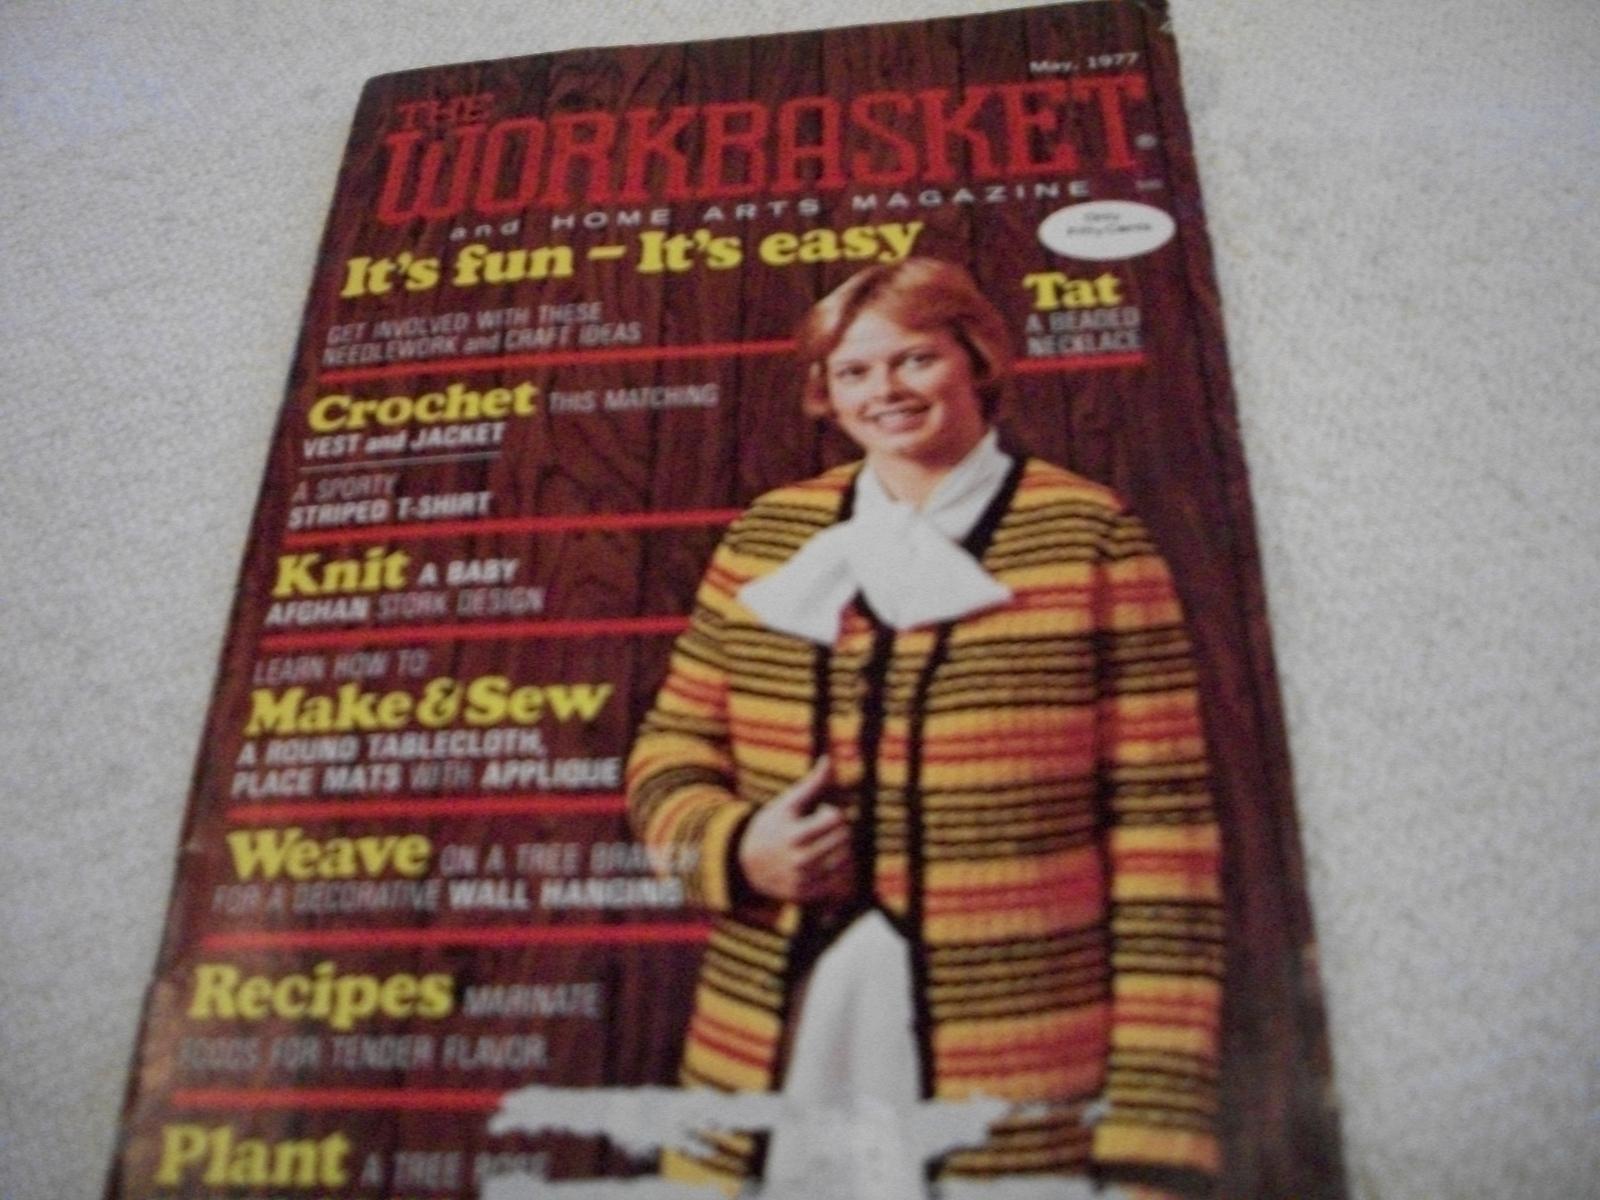 Workbasket Magazine May 1977 and 50 similar items